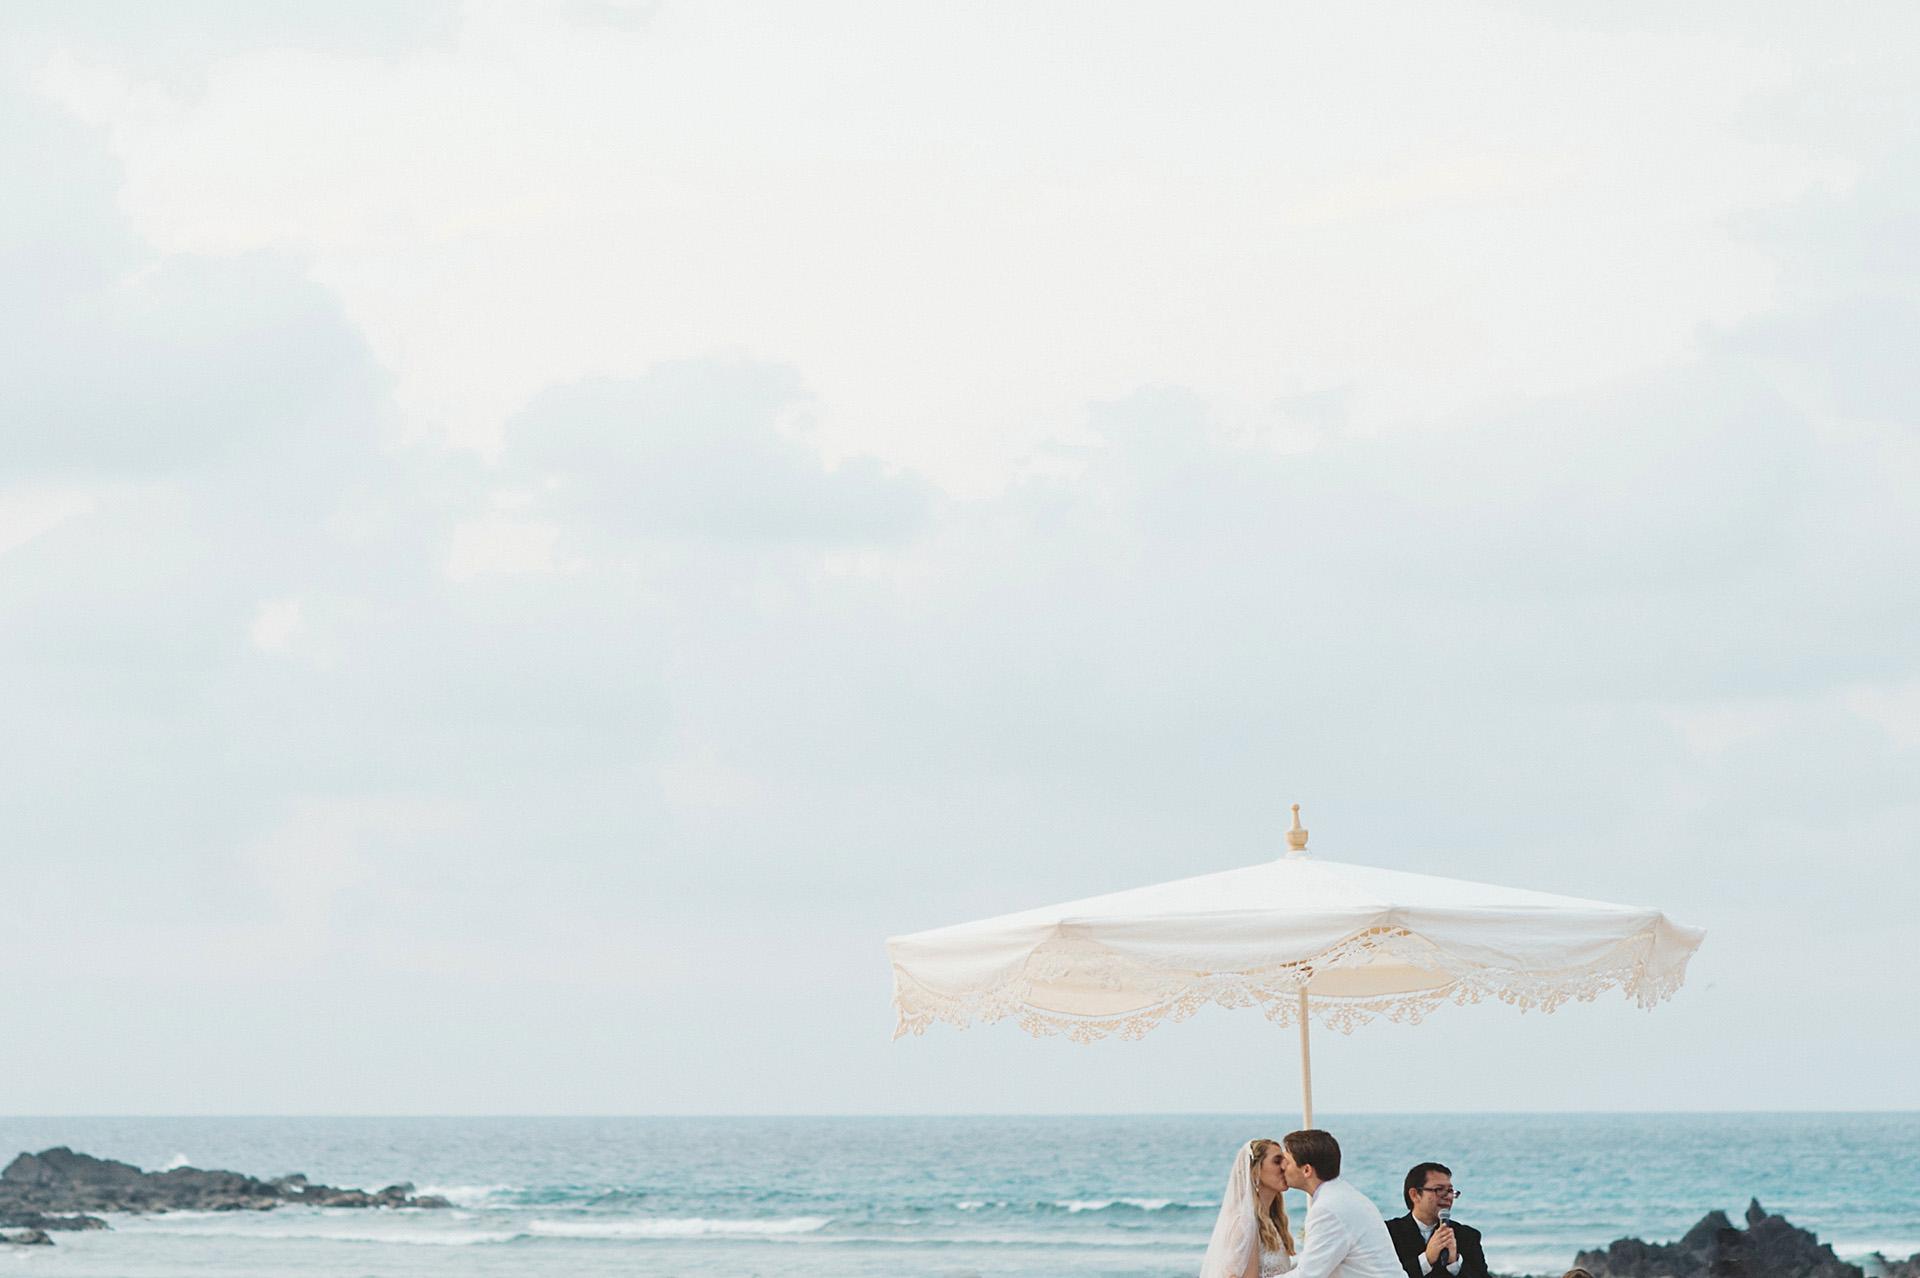 st regis beach wedding